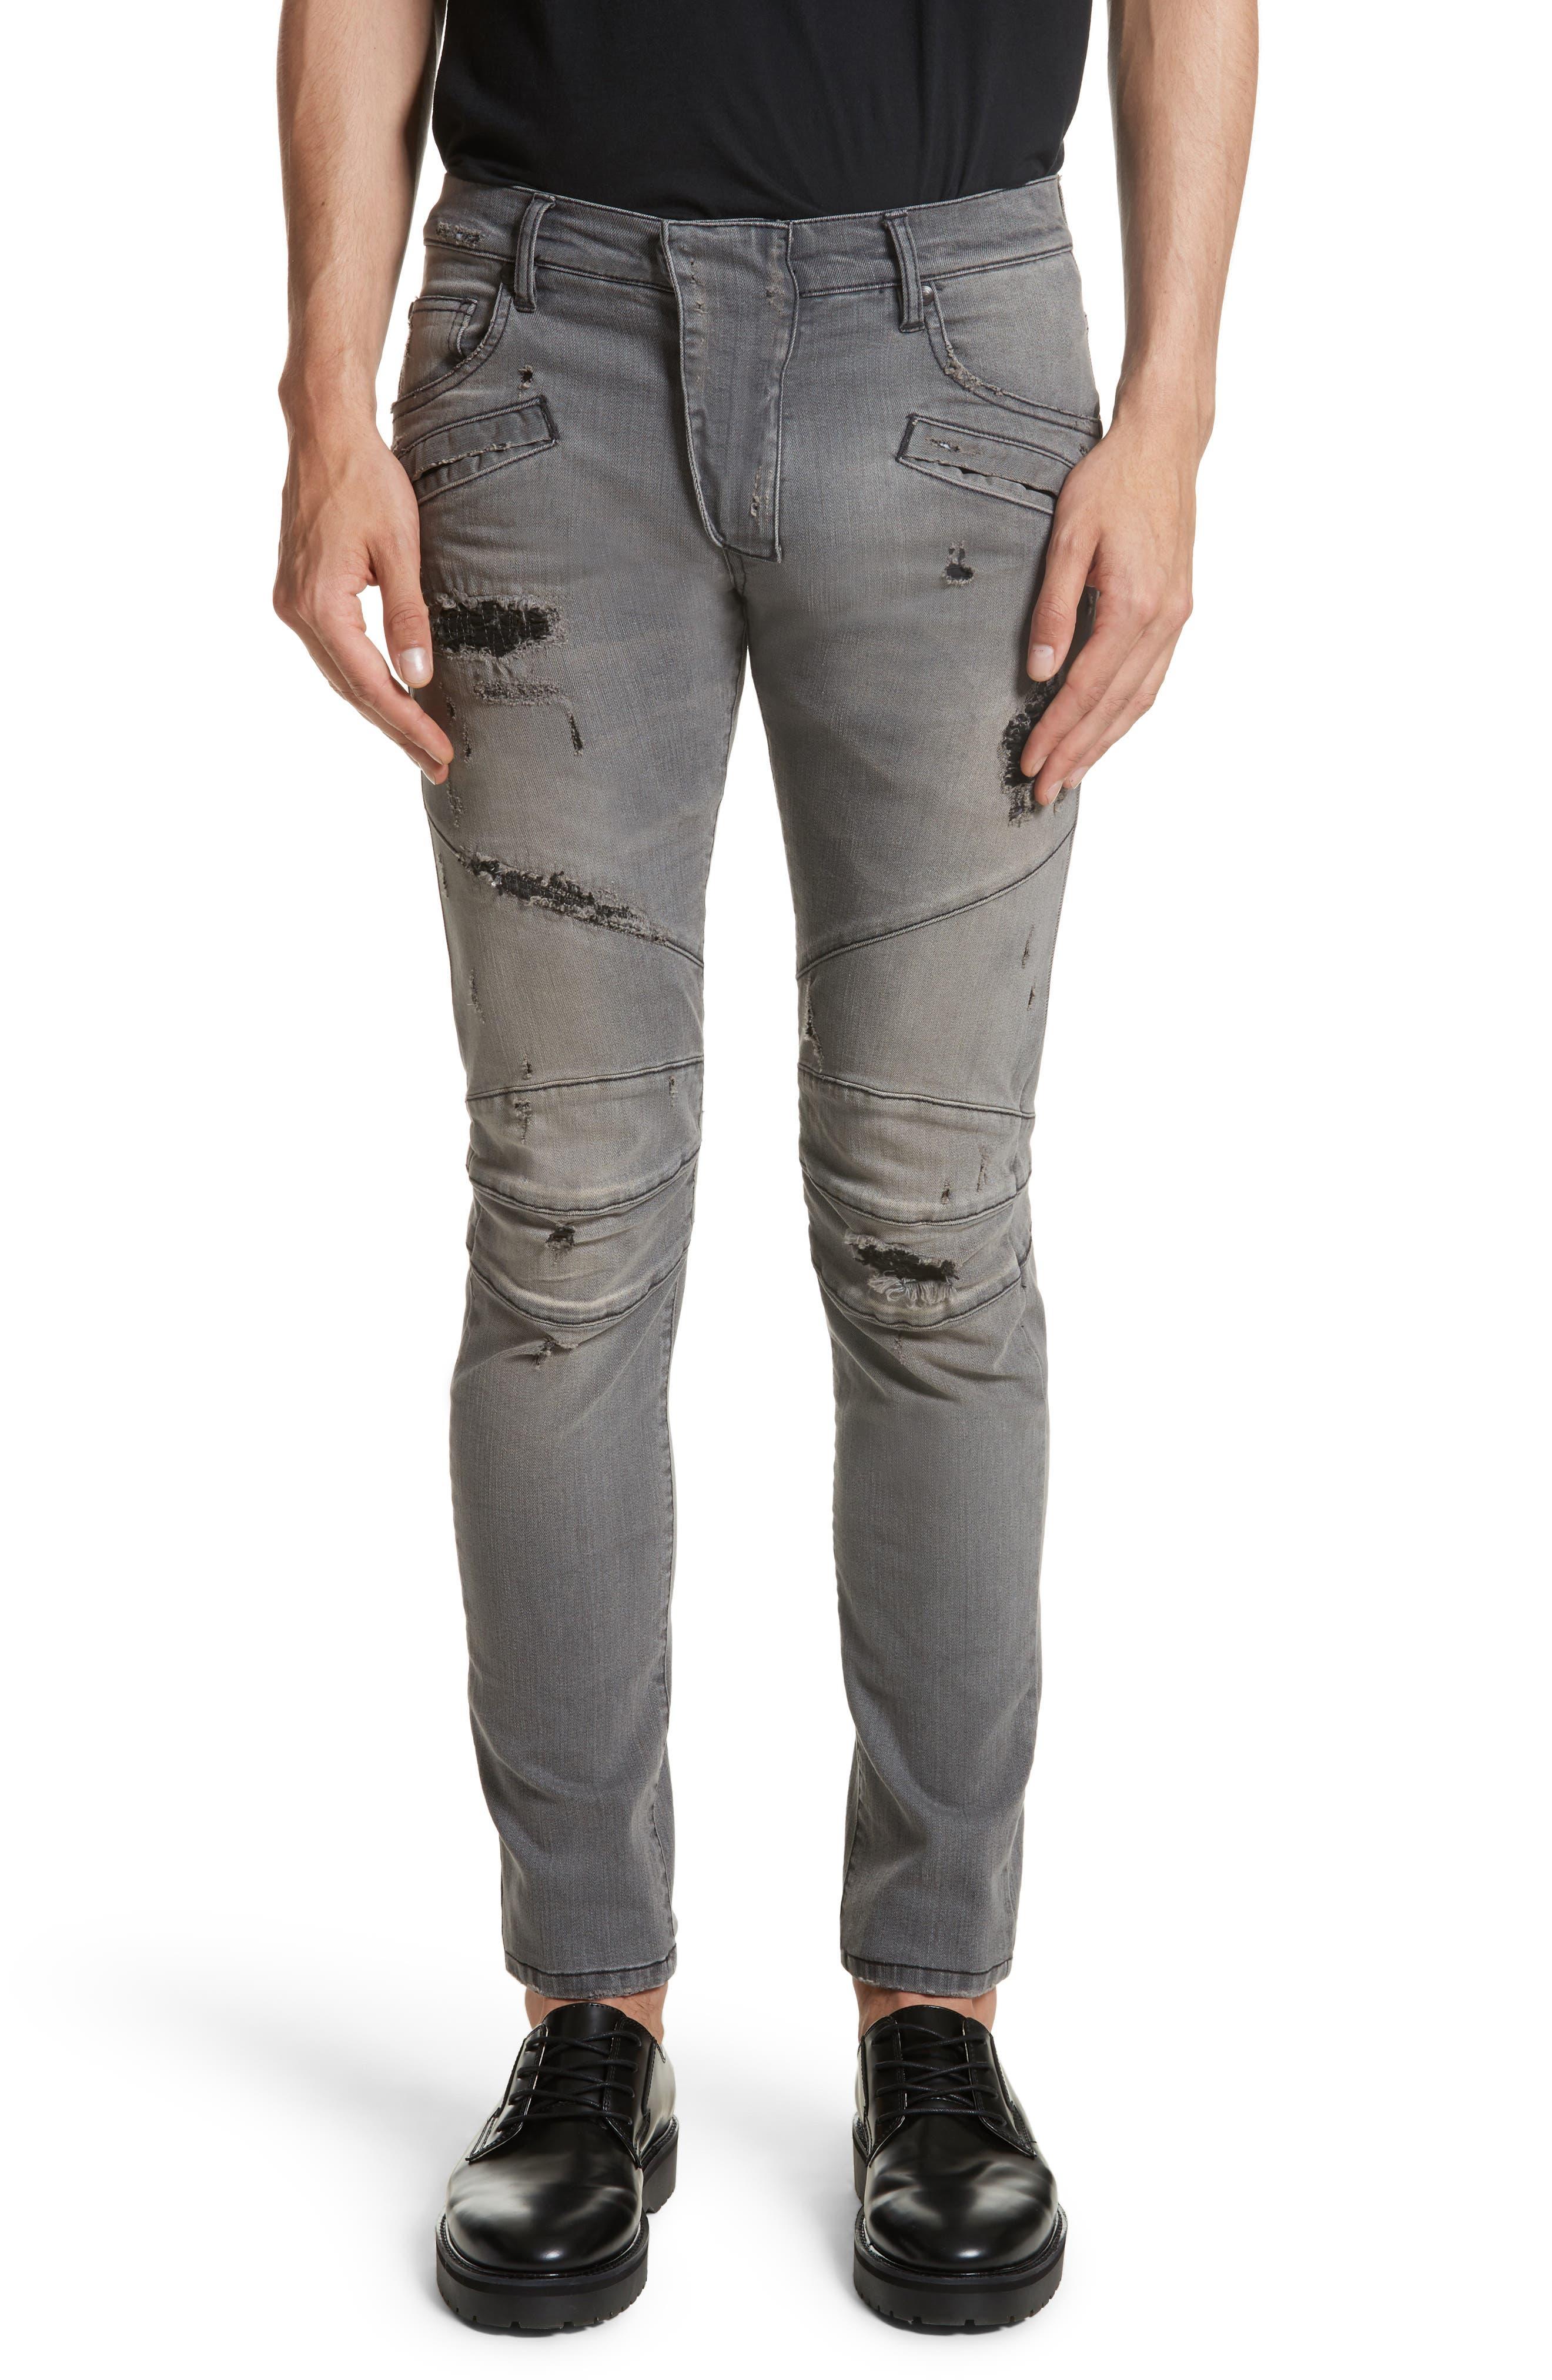 Alternate Image 1 Selected - Pierre Balmain Distressed Moto Jeans